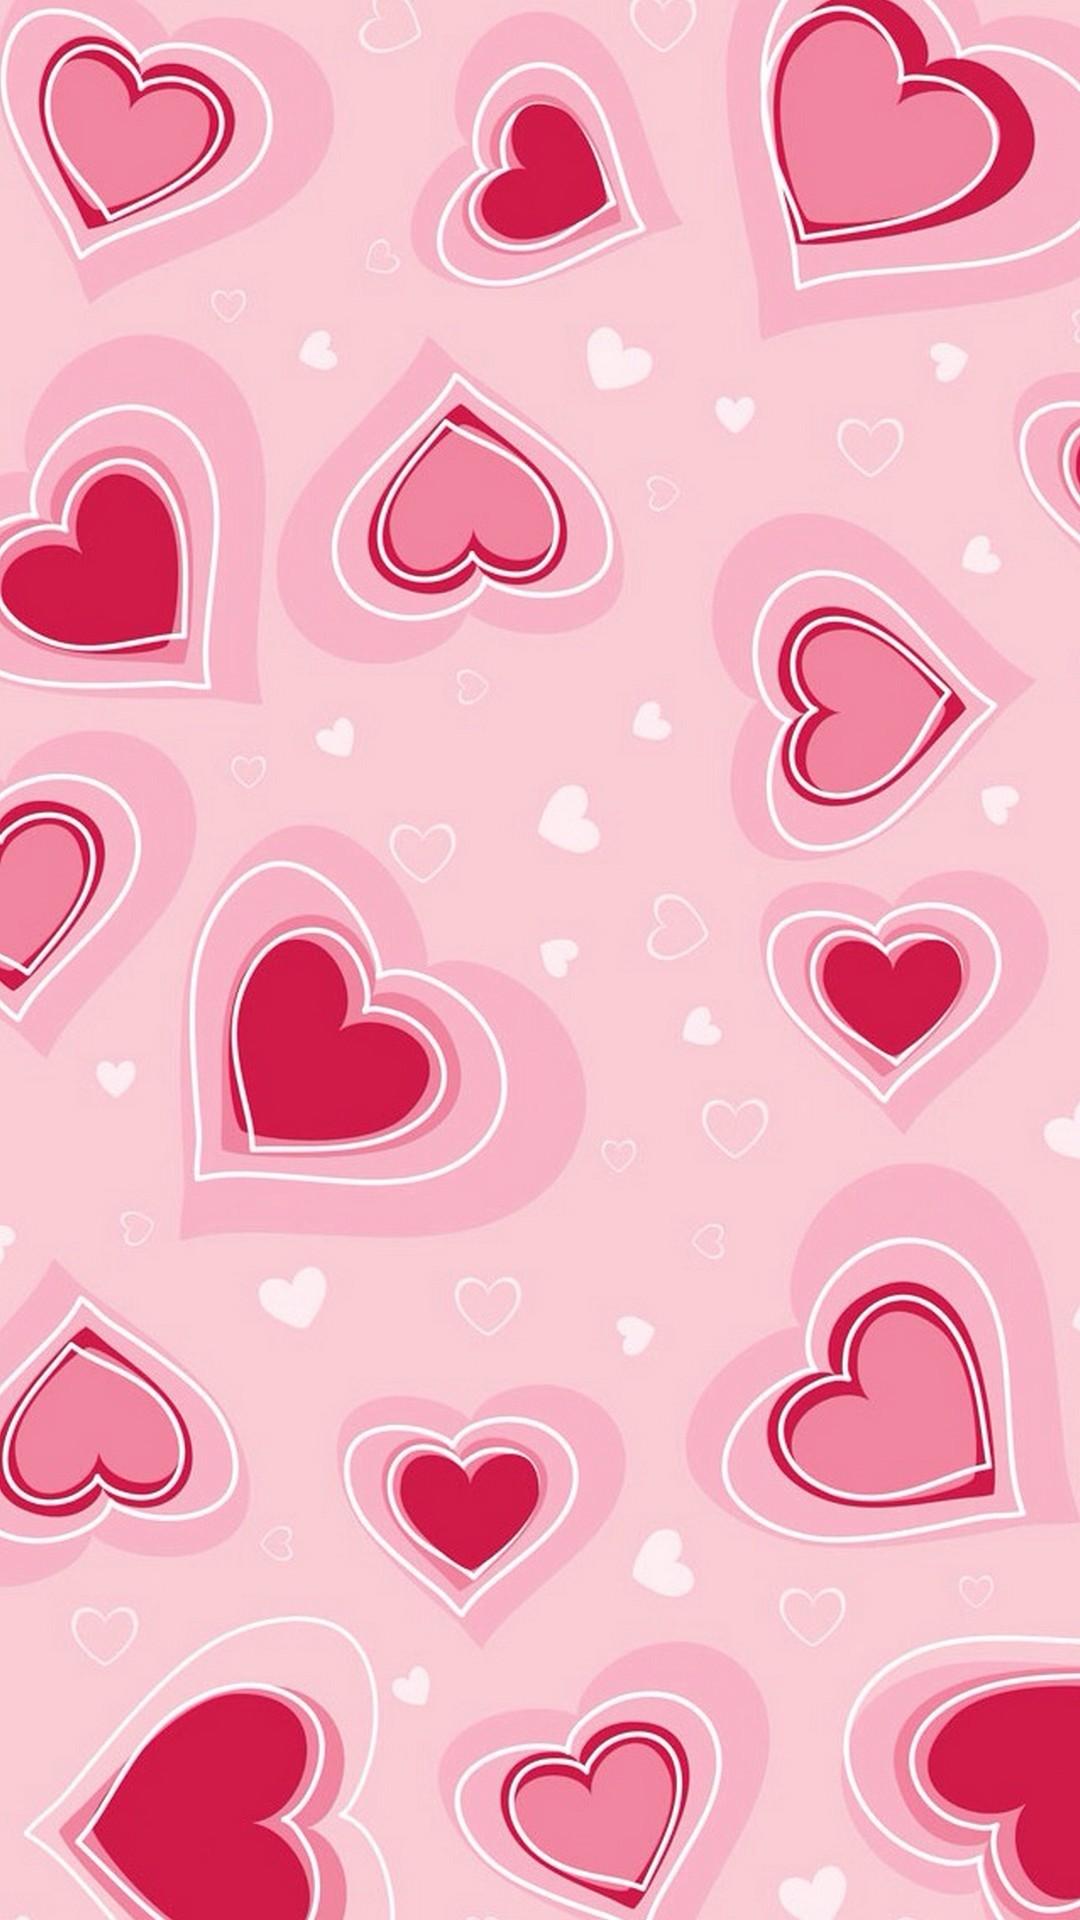 Valentines iphone 6 wallpaper